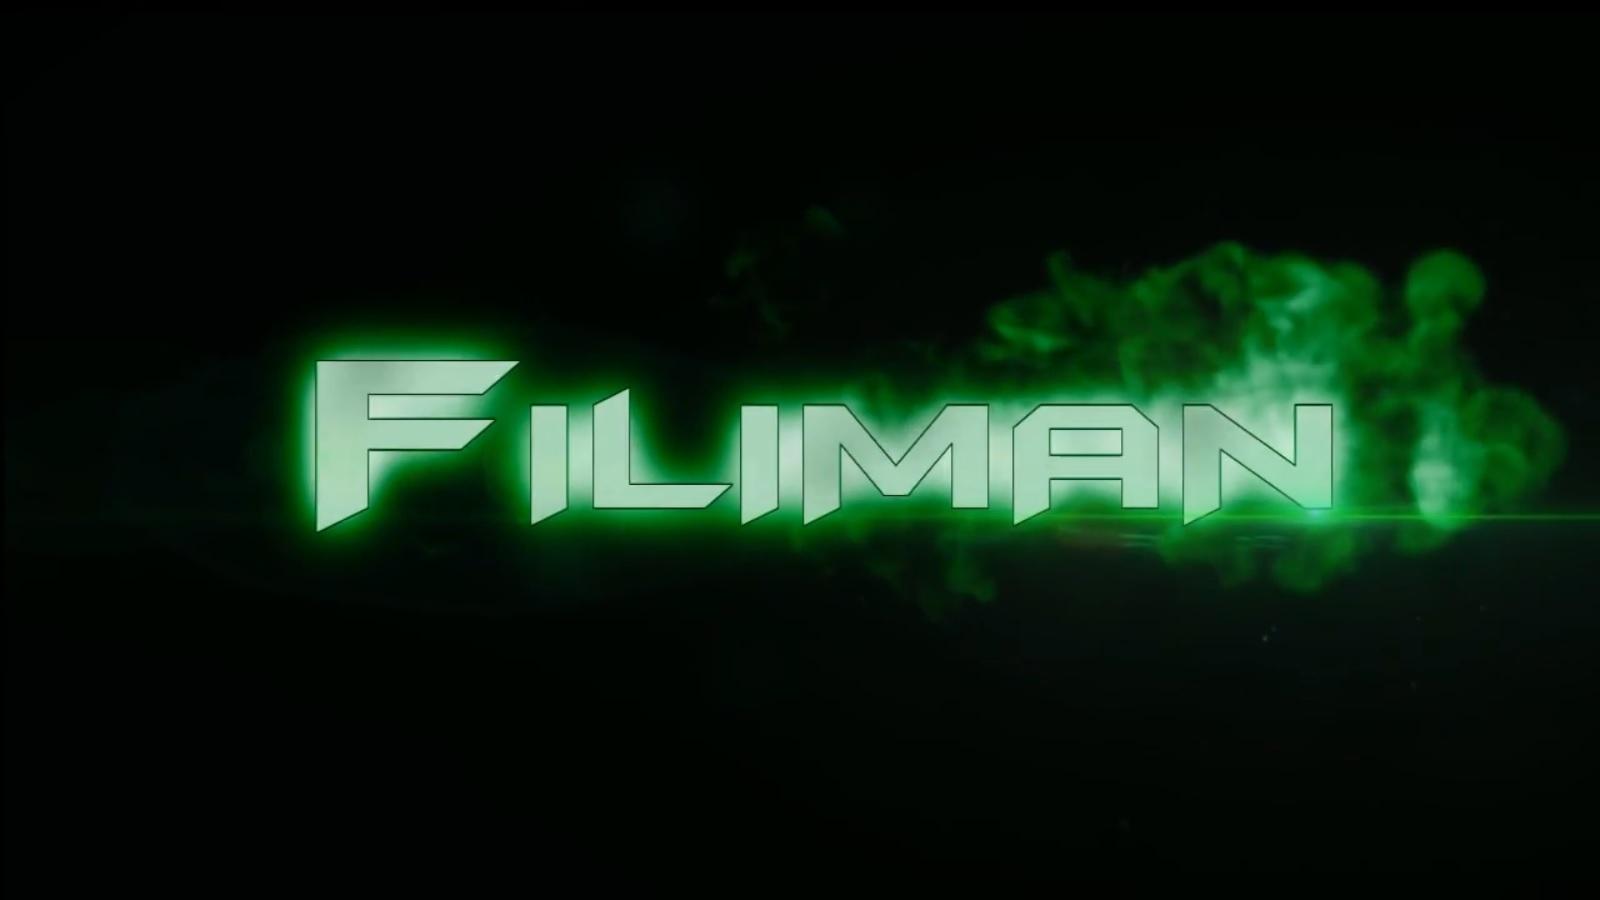 Filiman_Green